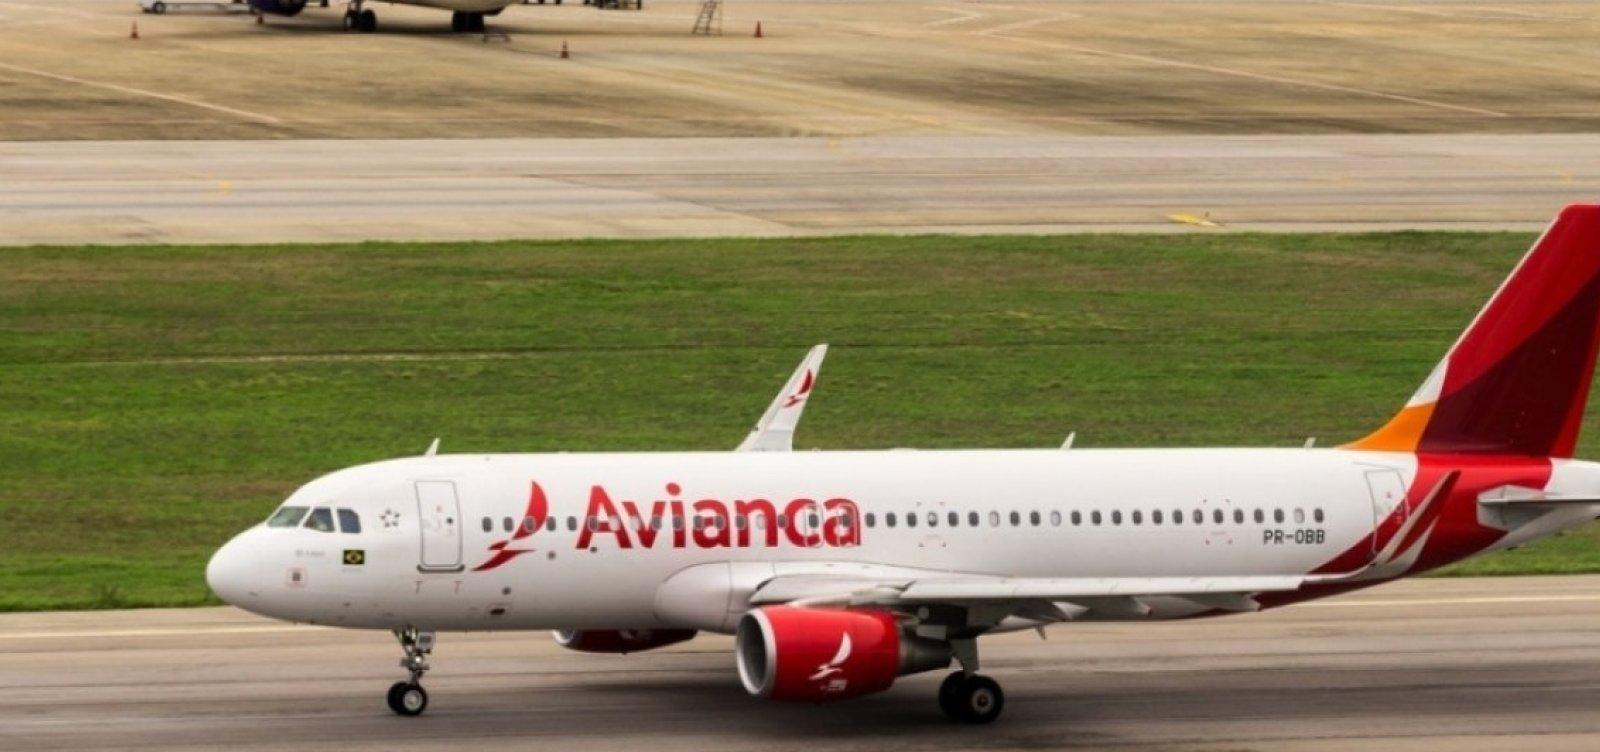 [Em Fortaleza, Avianca também só irá operar caso repasse tarifas dos voos]